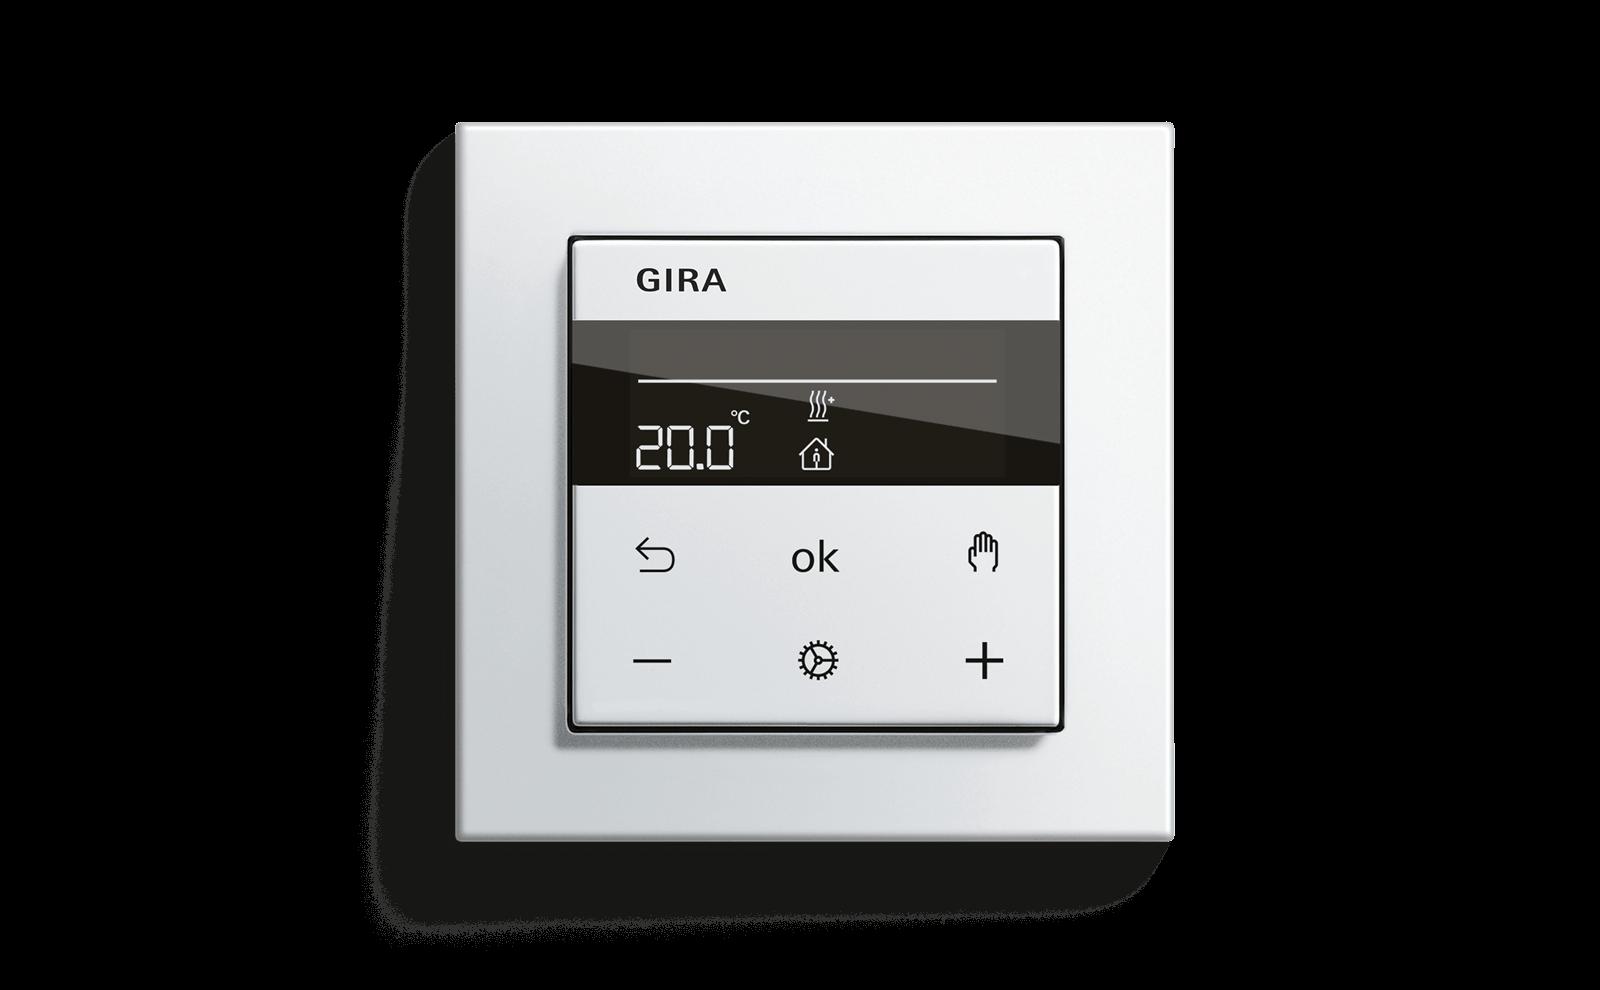 Gira System 3000 Aufsatz Heizungssteuerung